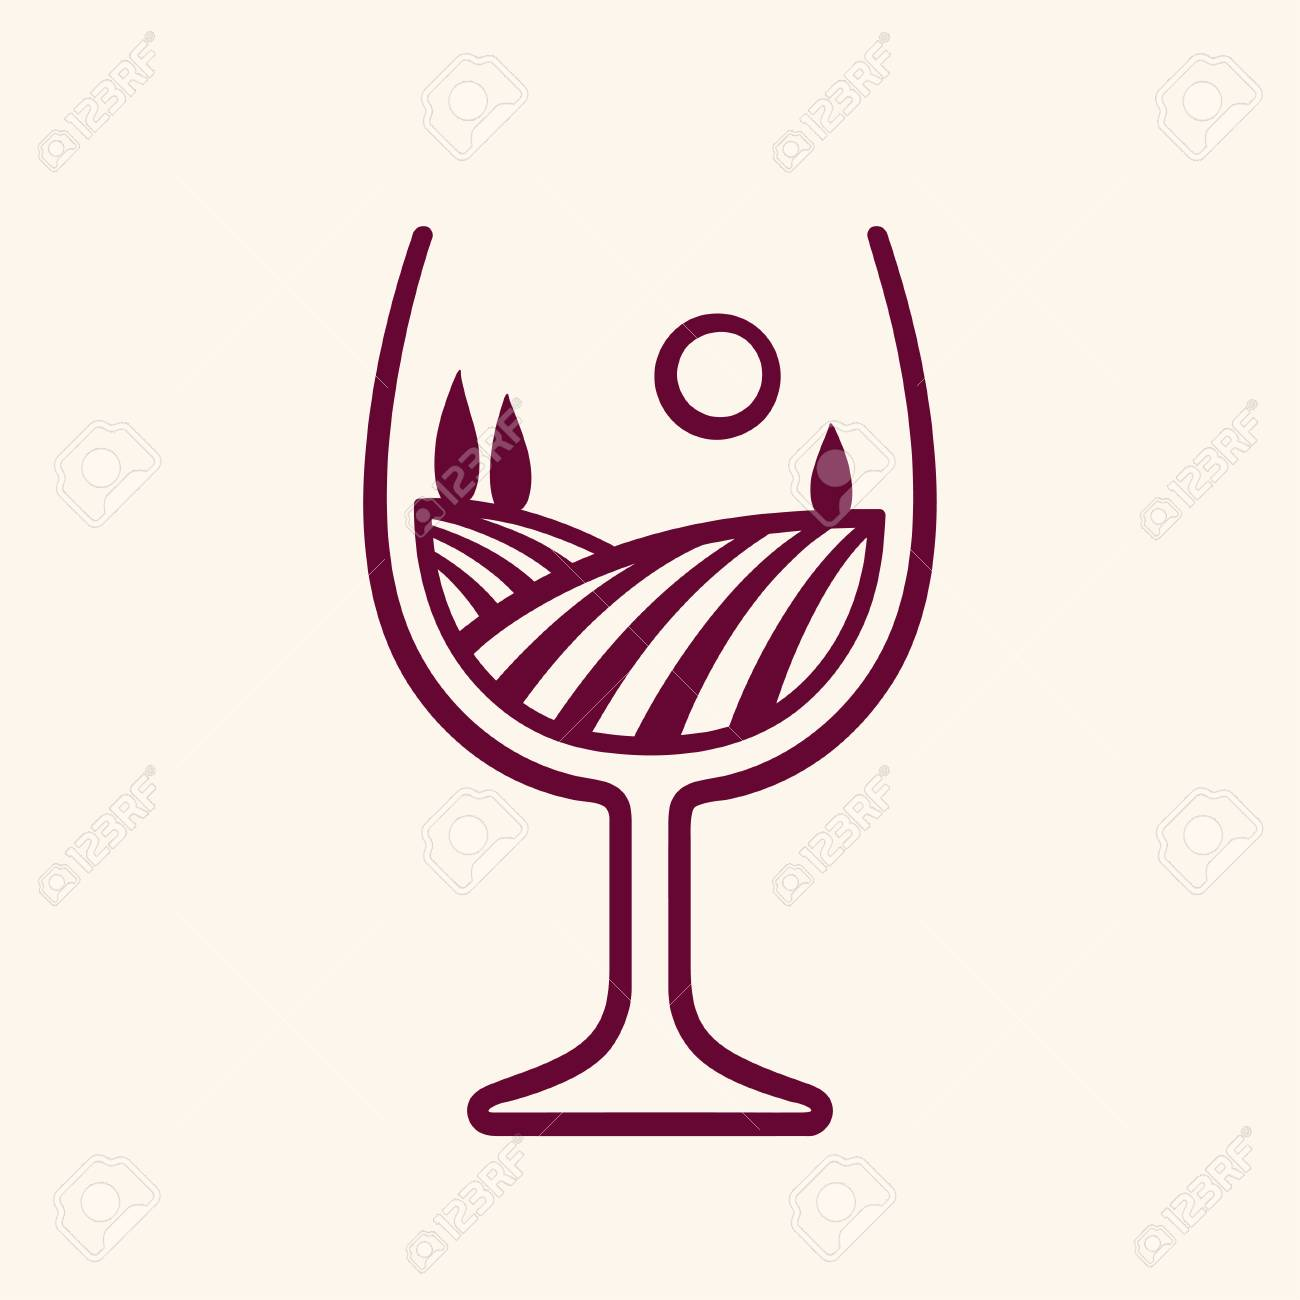 Stylized vineyard landscape in wine glass shape, vector illustration. Modern monochrome winery logo. - 95218811